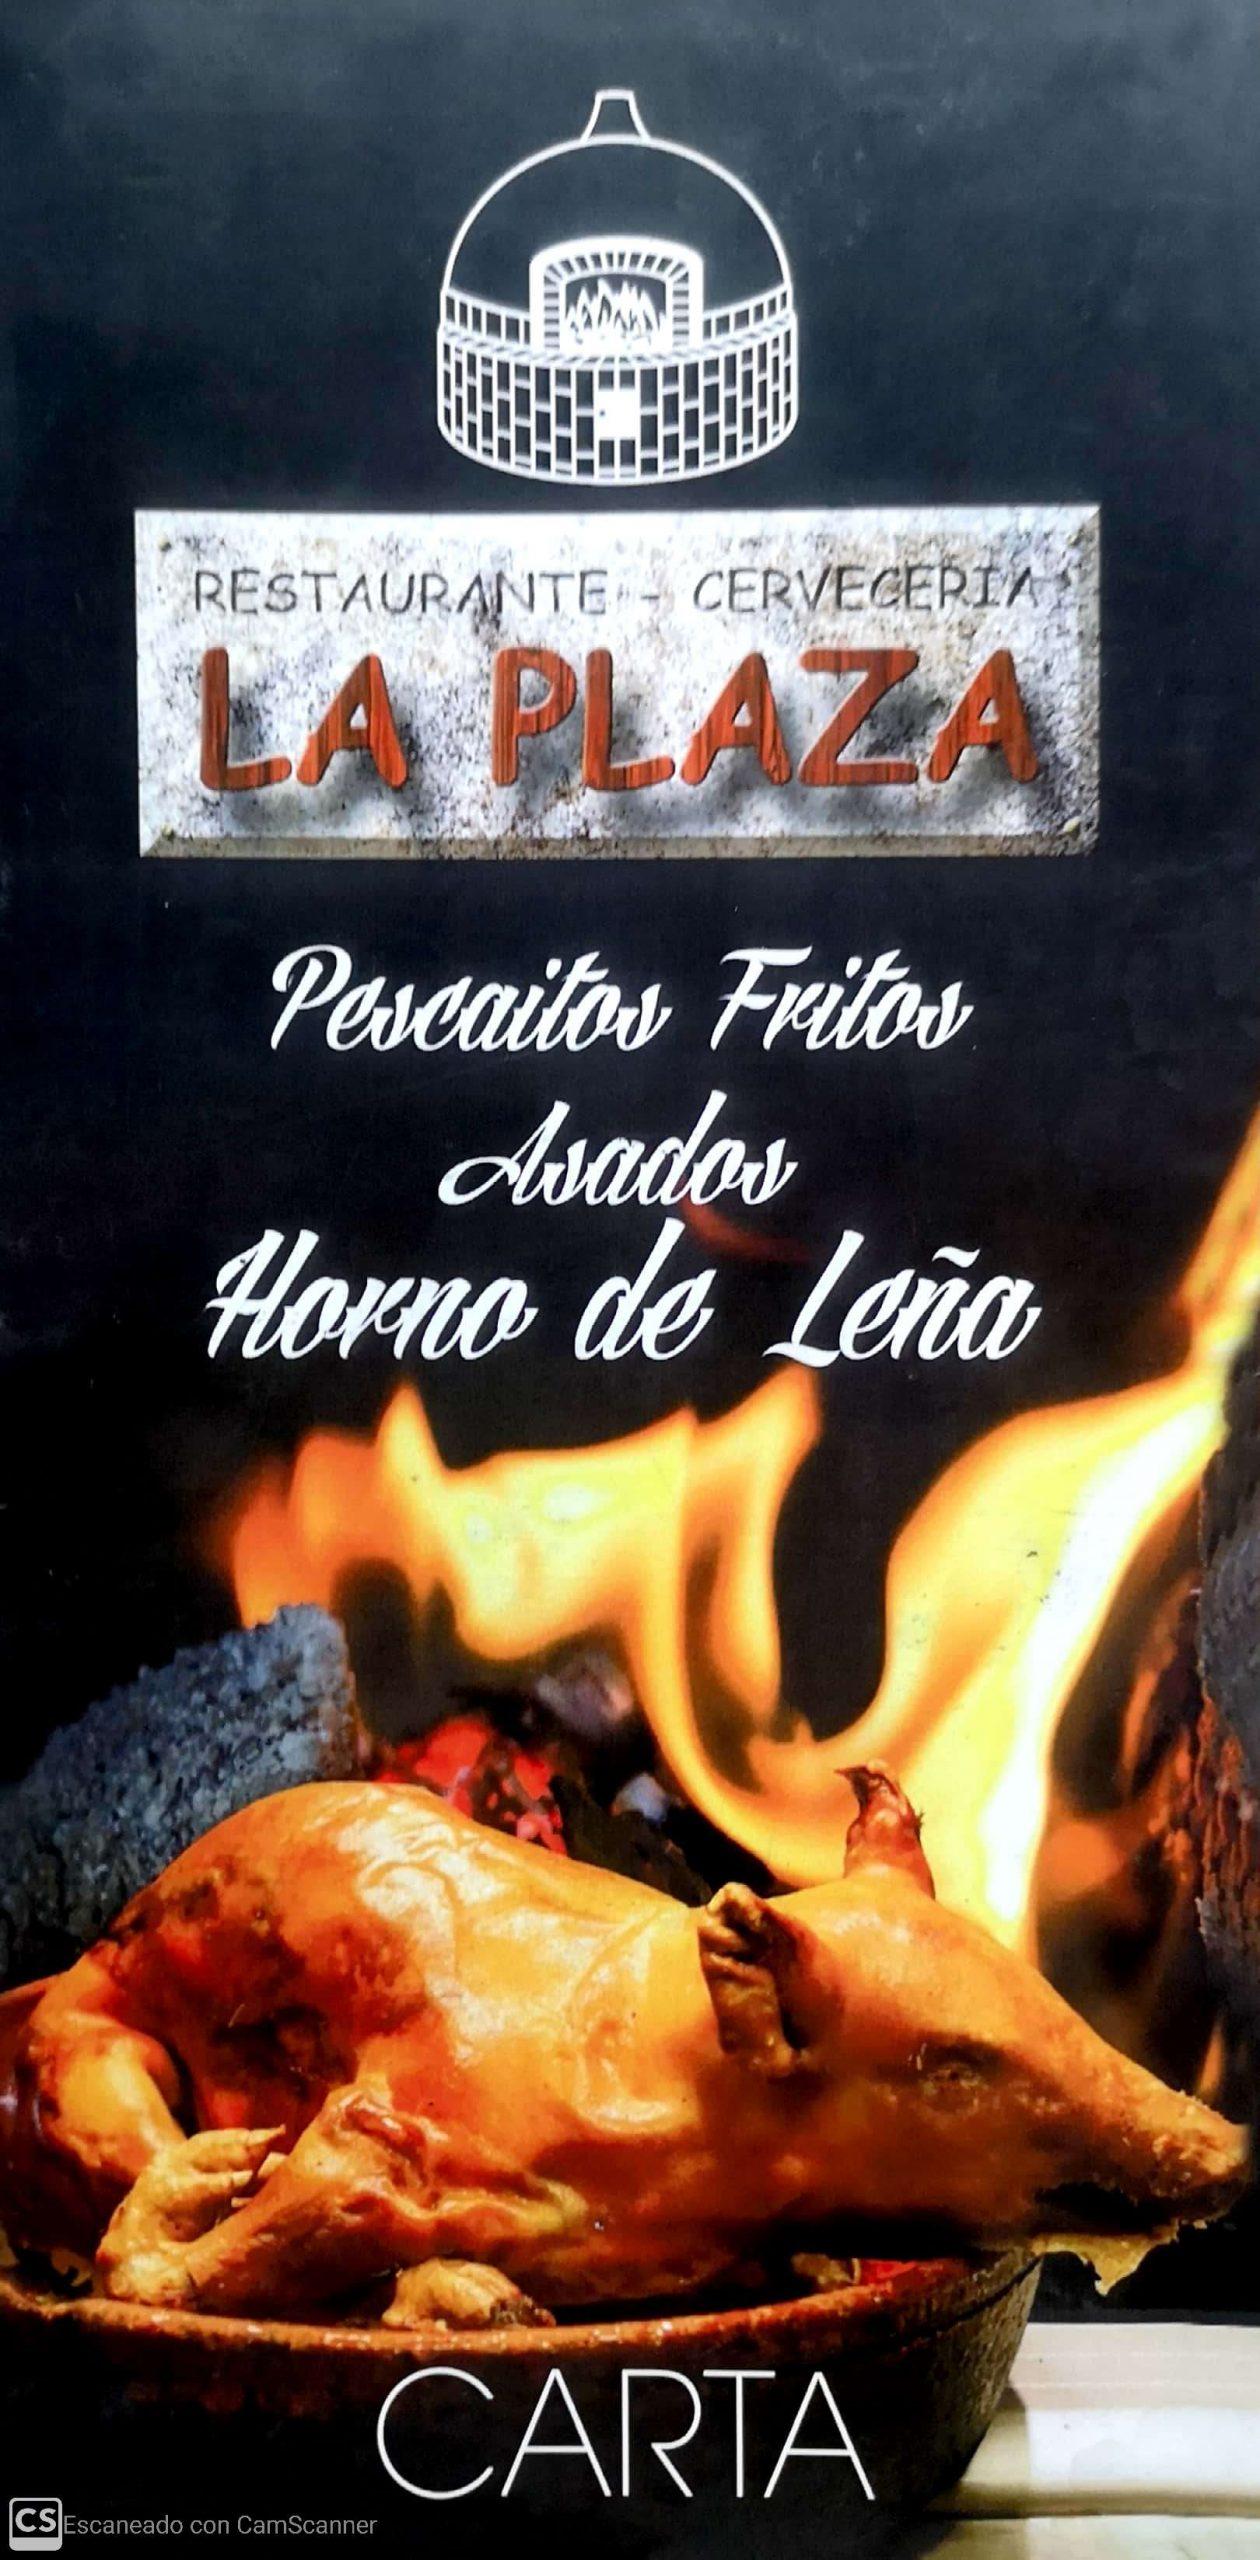 Carta del Restaurante La Plaza